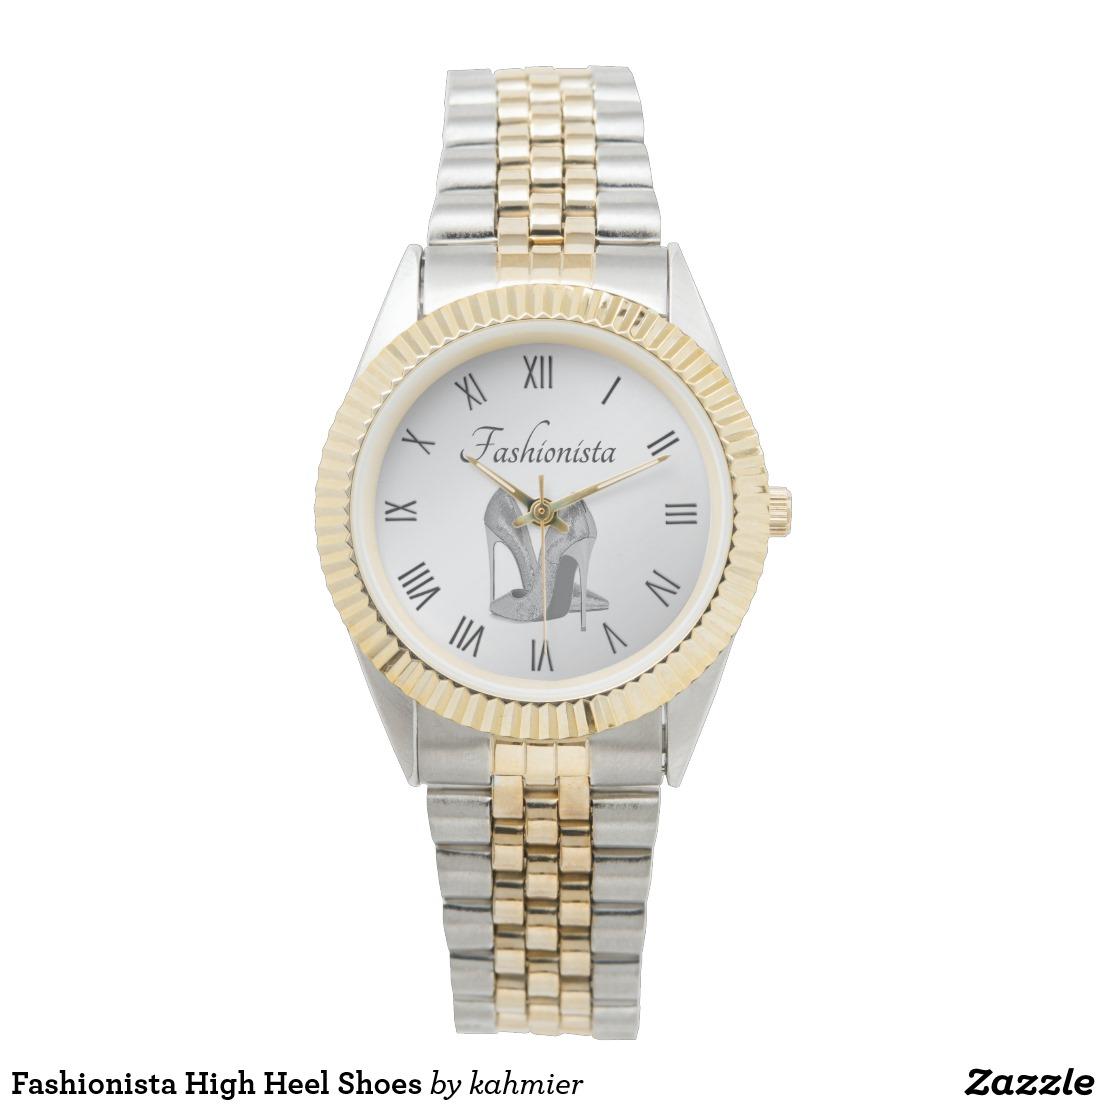 Fashionista High Heel Shoes Watch